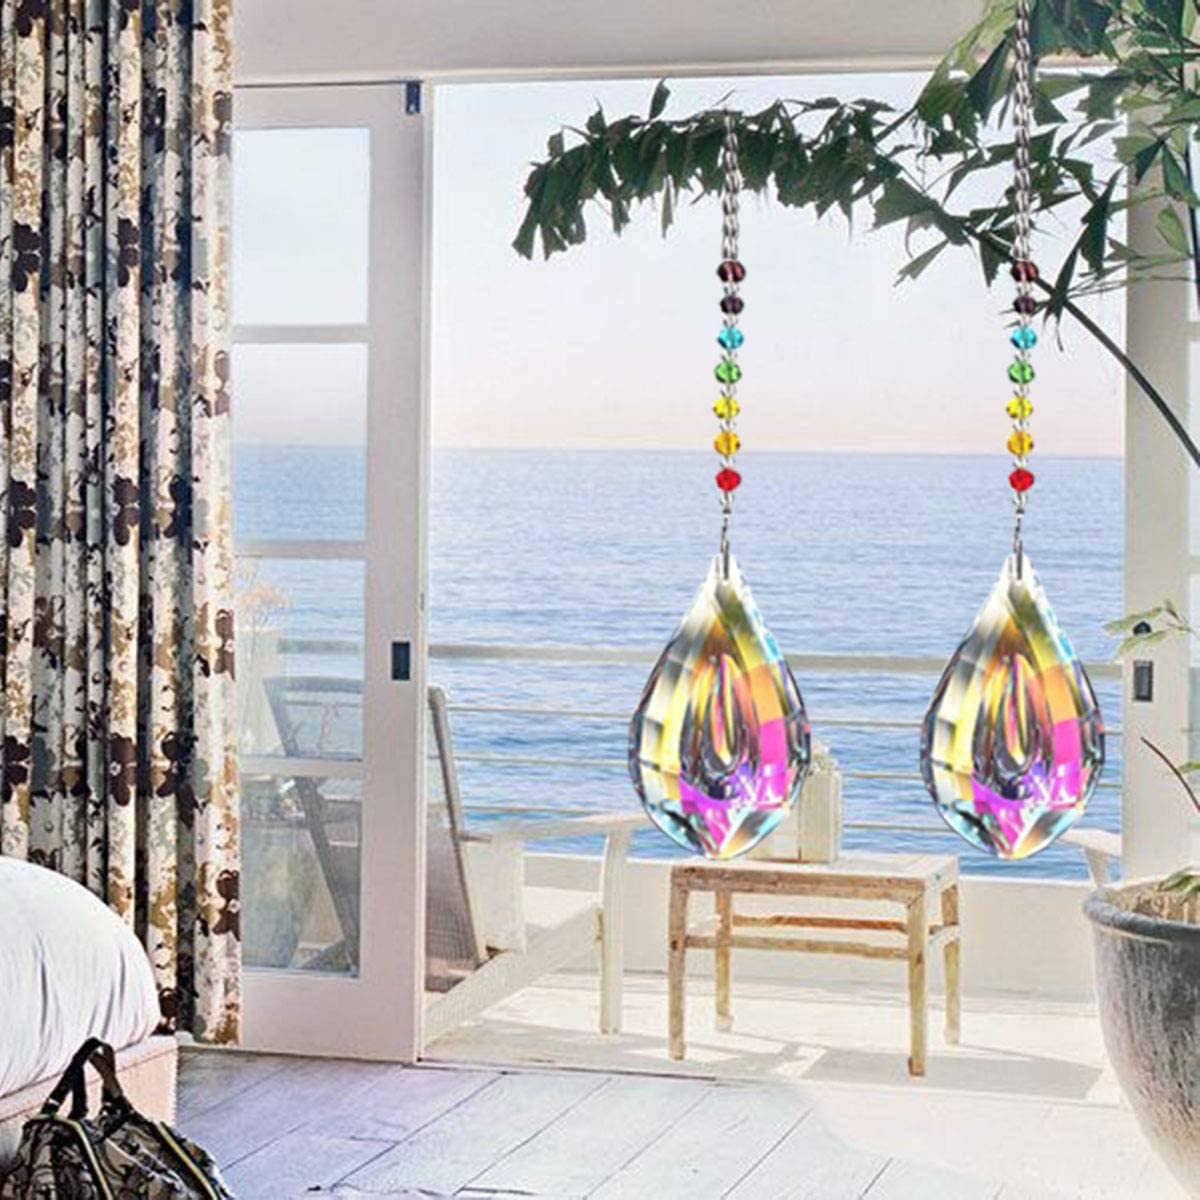 Feng Shui Regenbogenmacher Kristall Kronleuchter Kristall Prismen Anh/änger 76mm Nice Dream Sonnenf/änger mit Kristallanh/ängern f/ürs Fenster Regenbogen